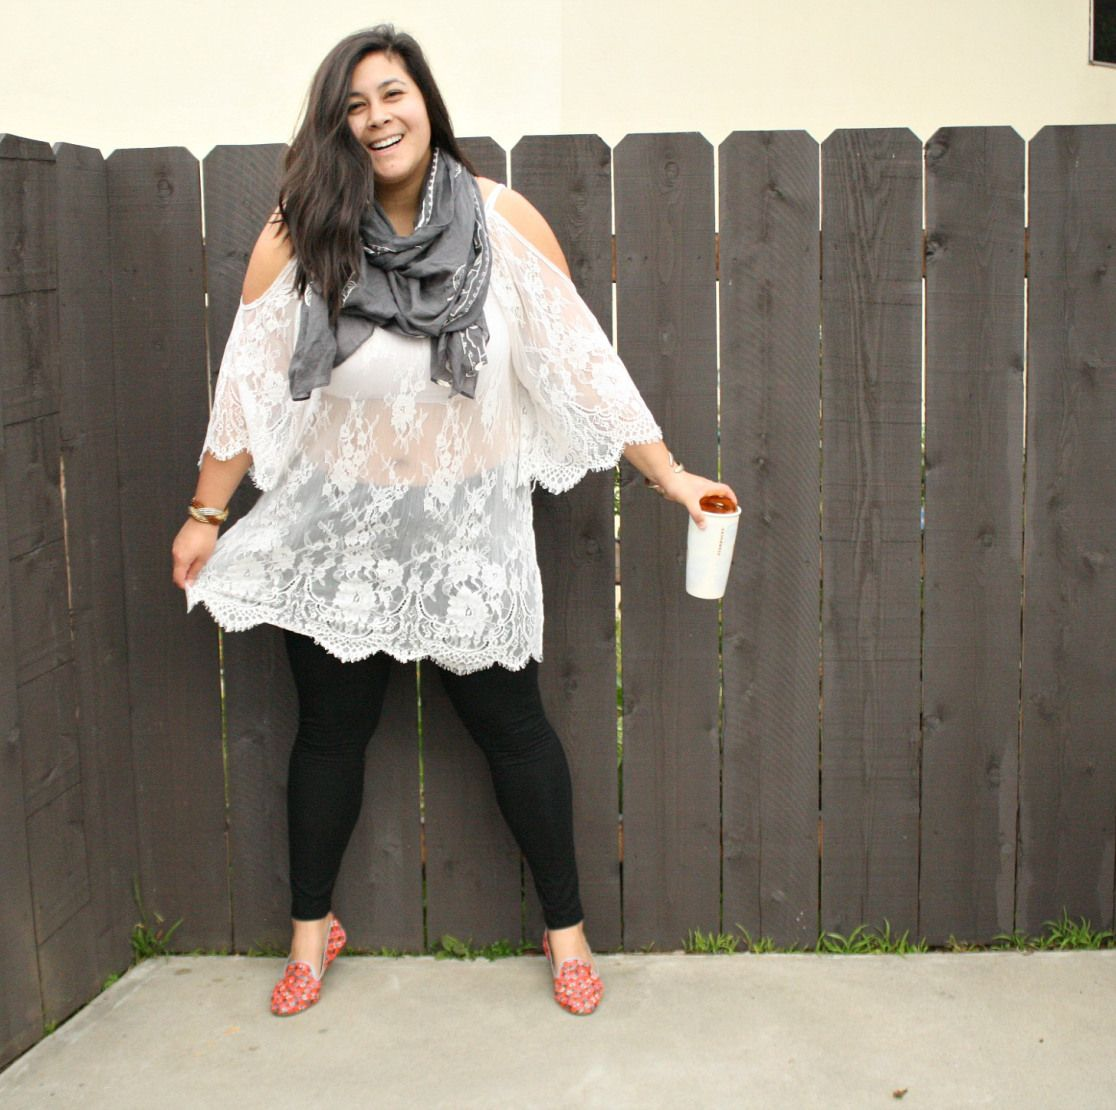 Sheer mini lace dress and leggings; OOTD   Lace dress, Bohemian ...